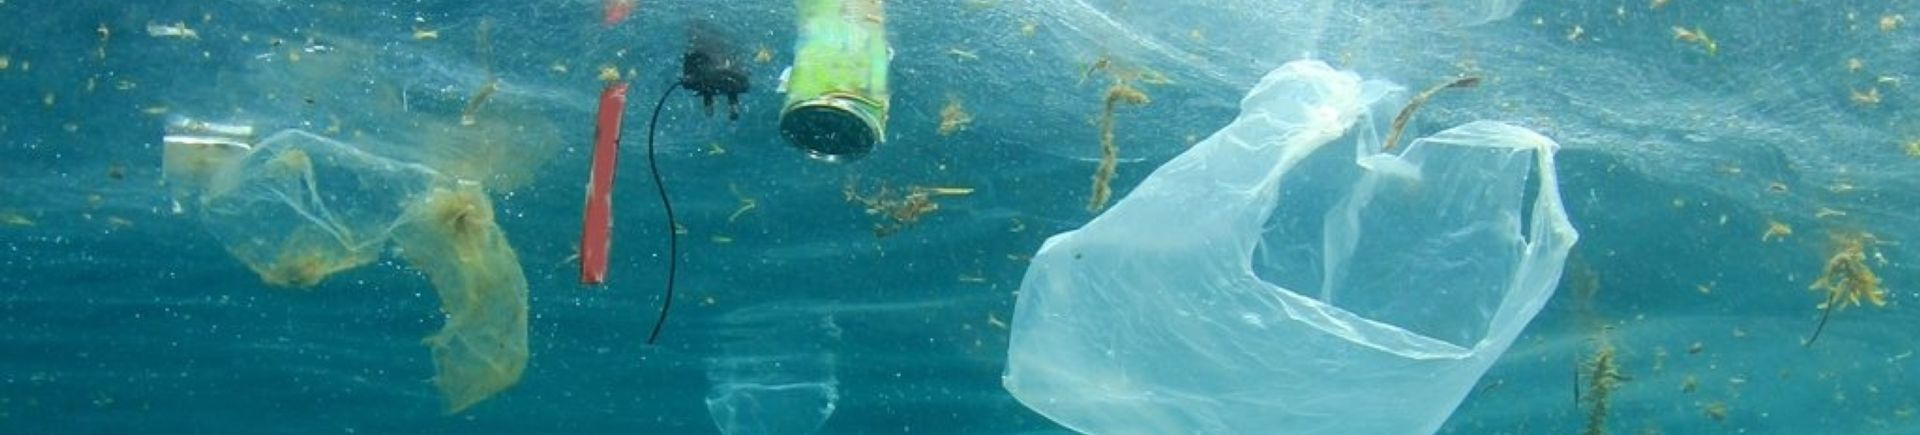 Reduce Marine Litter